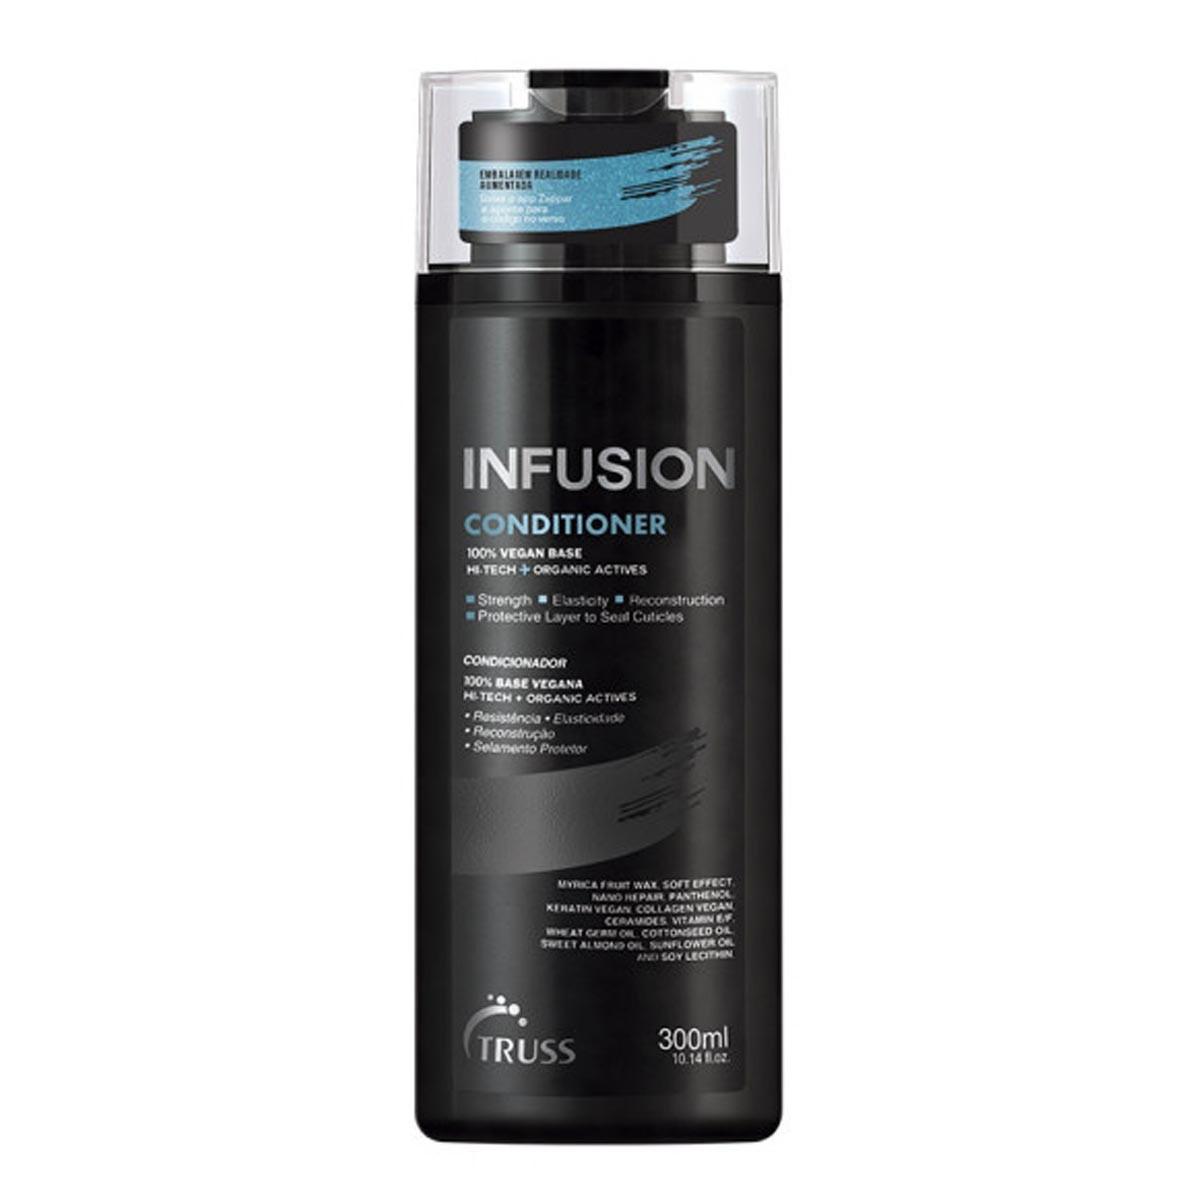 Truss Condicionador Infusion 300ml